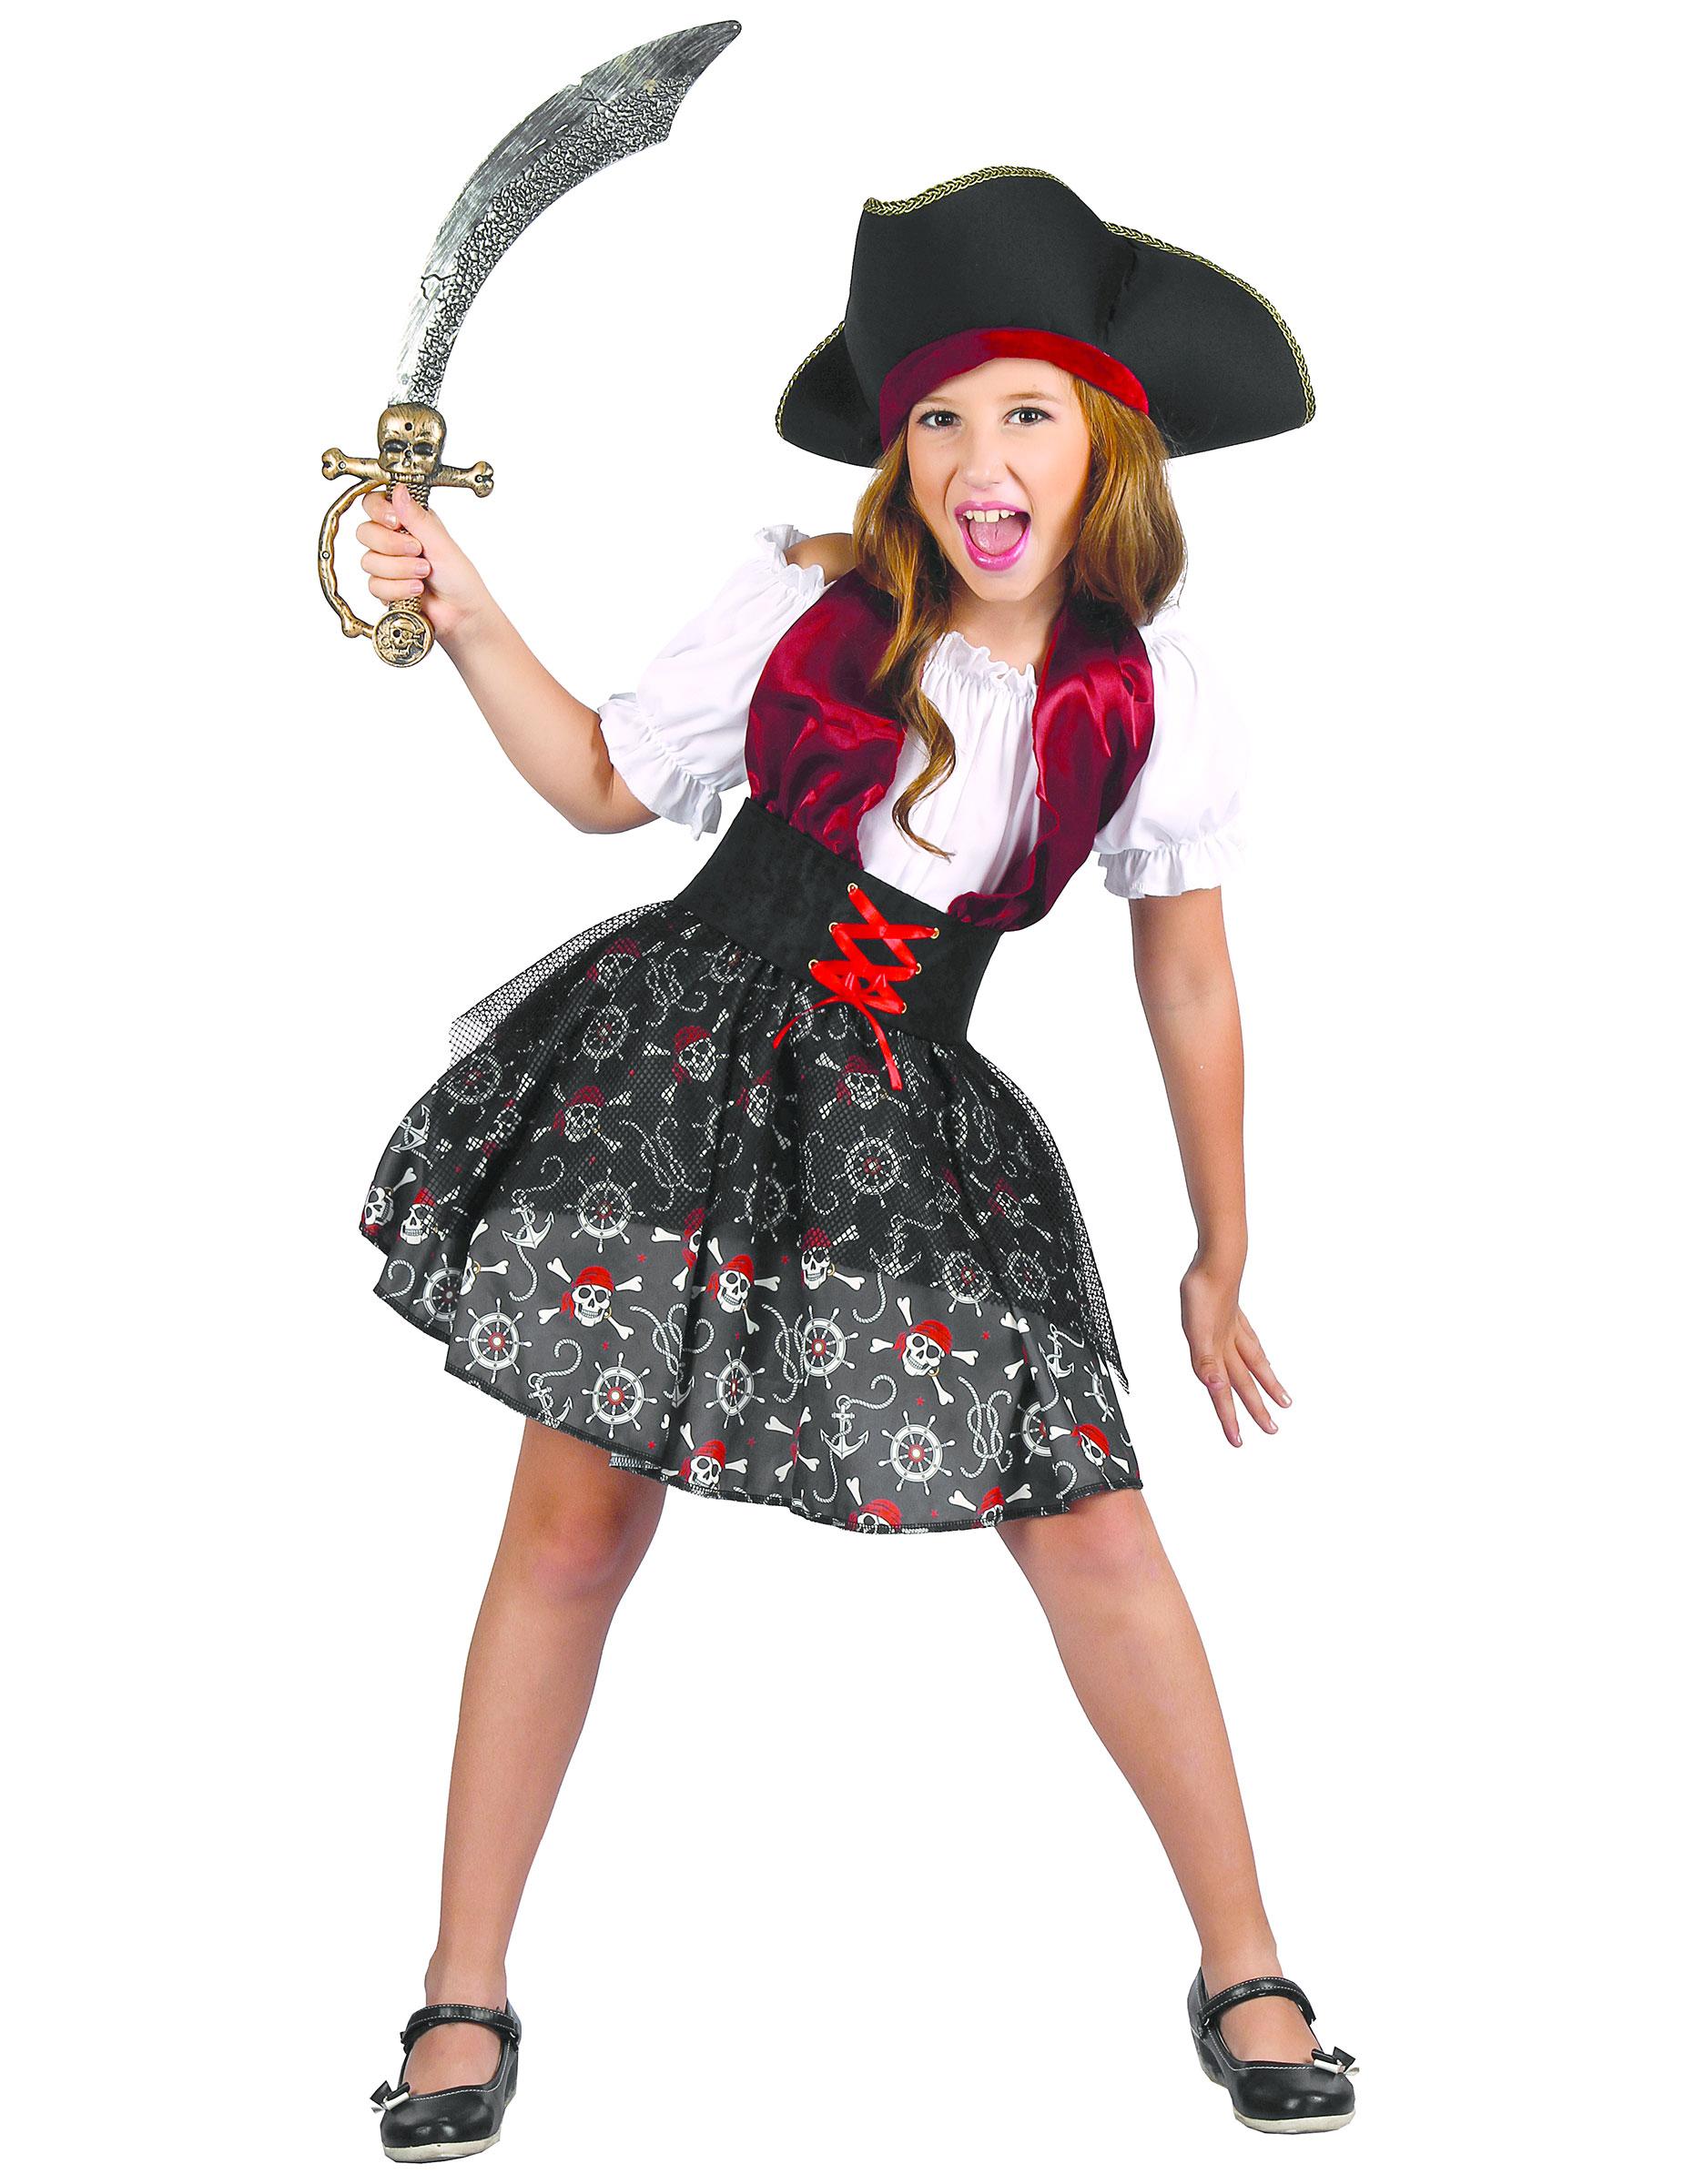 Bezaubernde Piratenbraut Kostum Fur Kinder Bunt